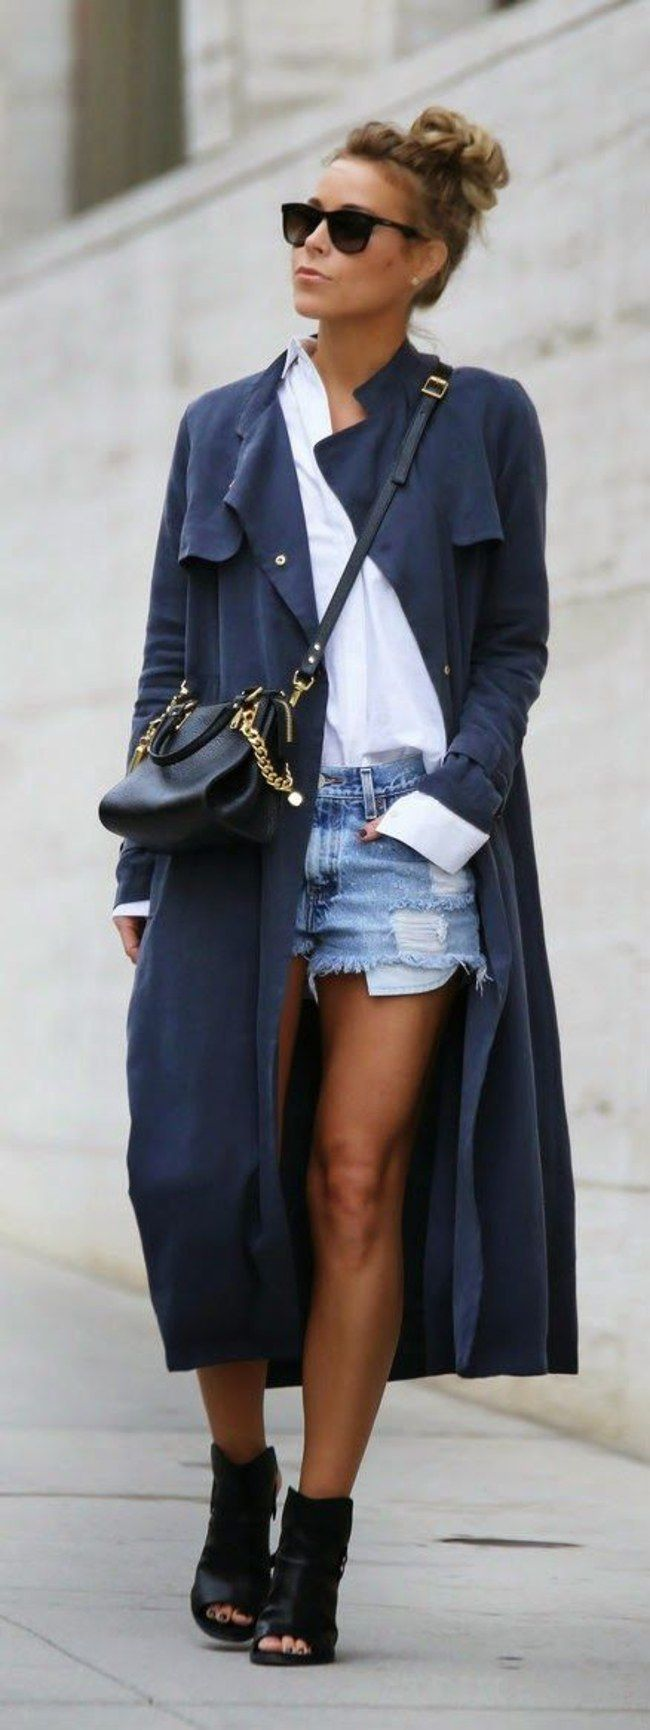 983 best street style & stylizacje images on pinterest | clothes